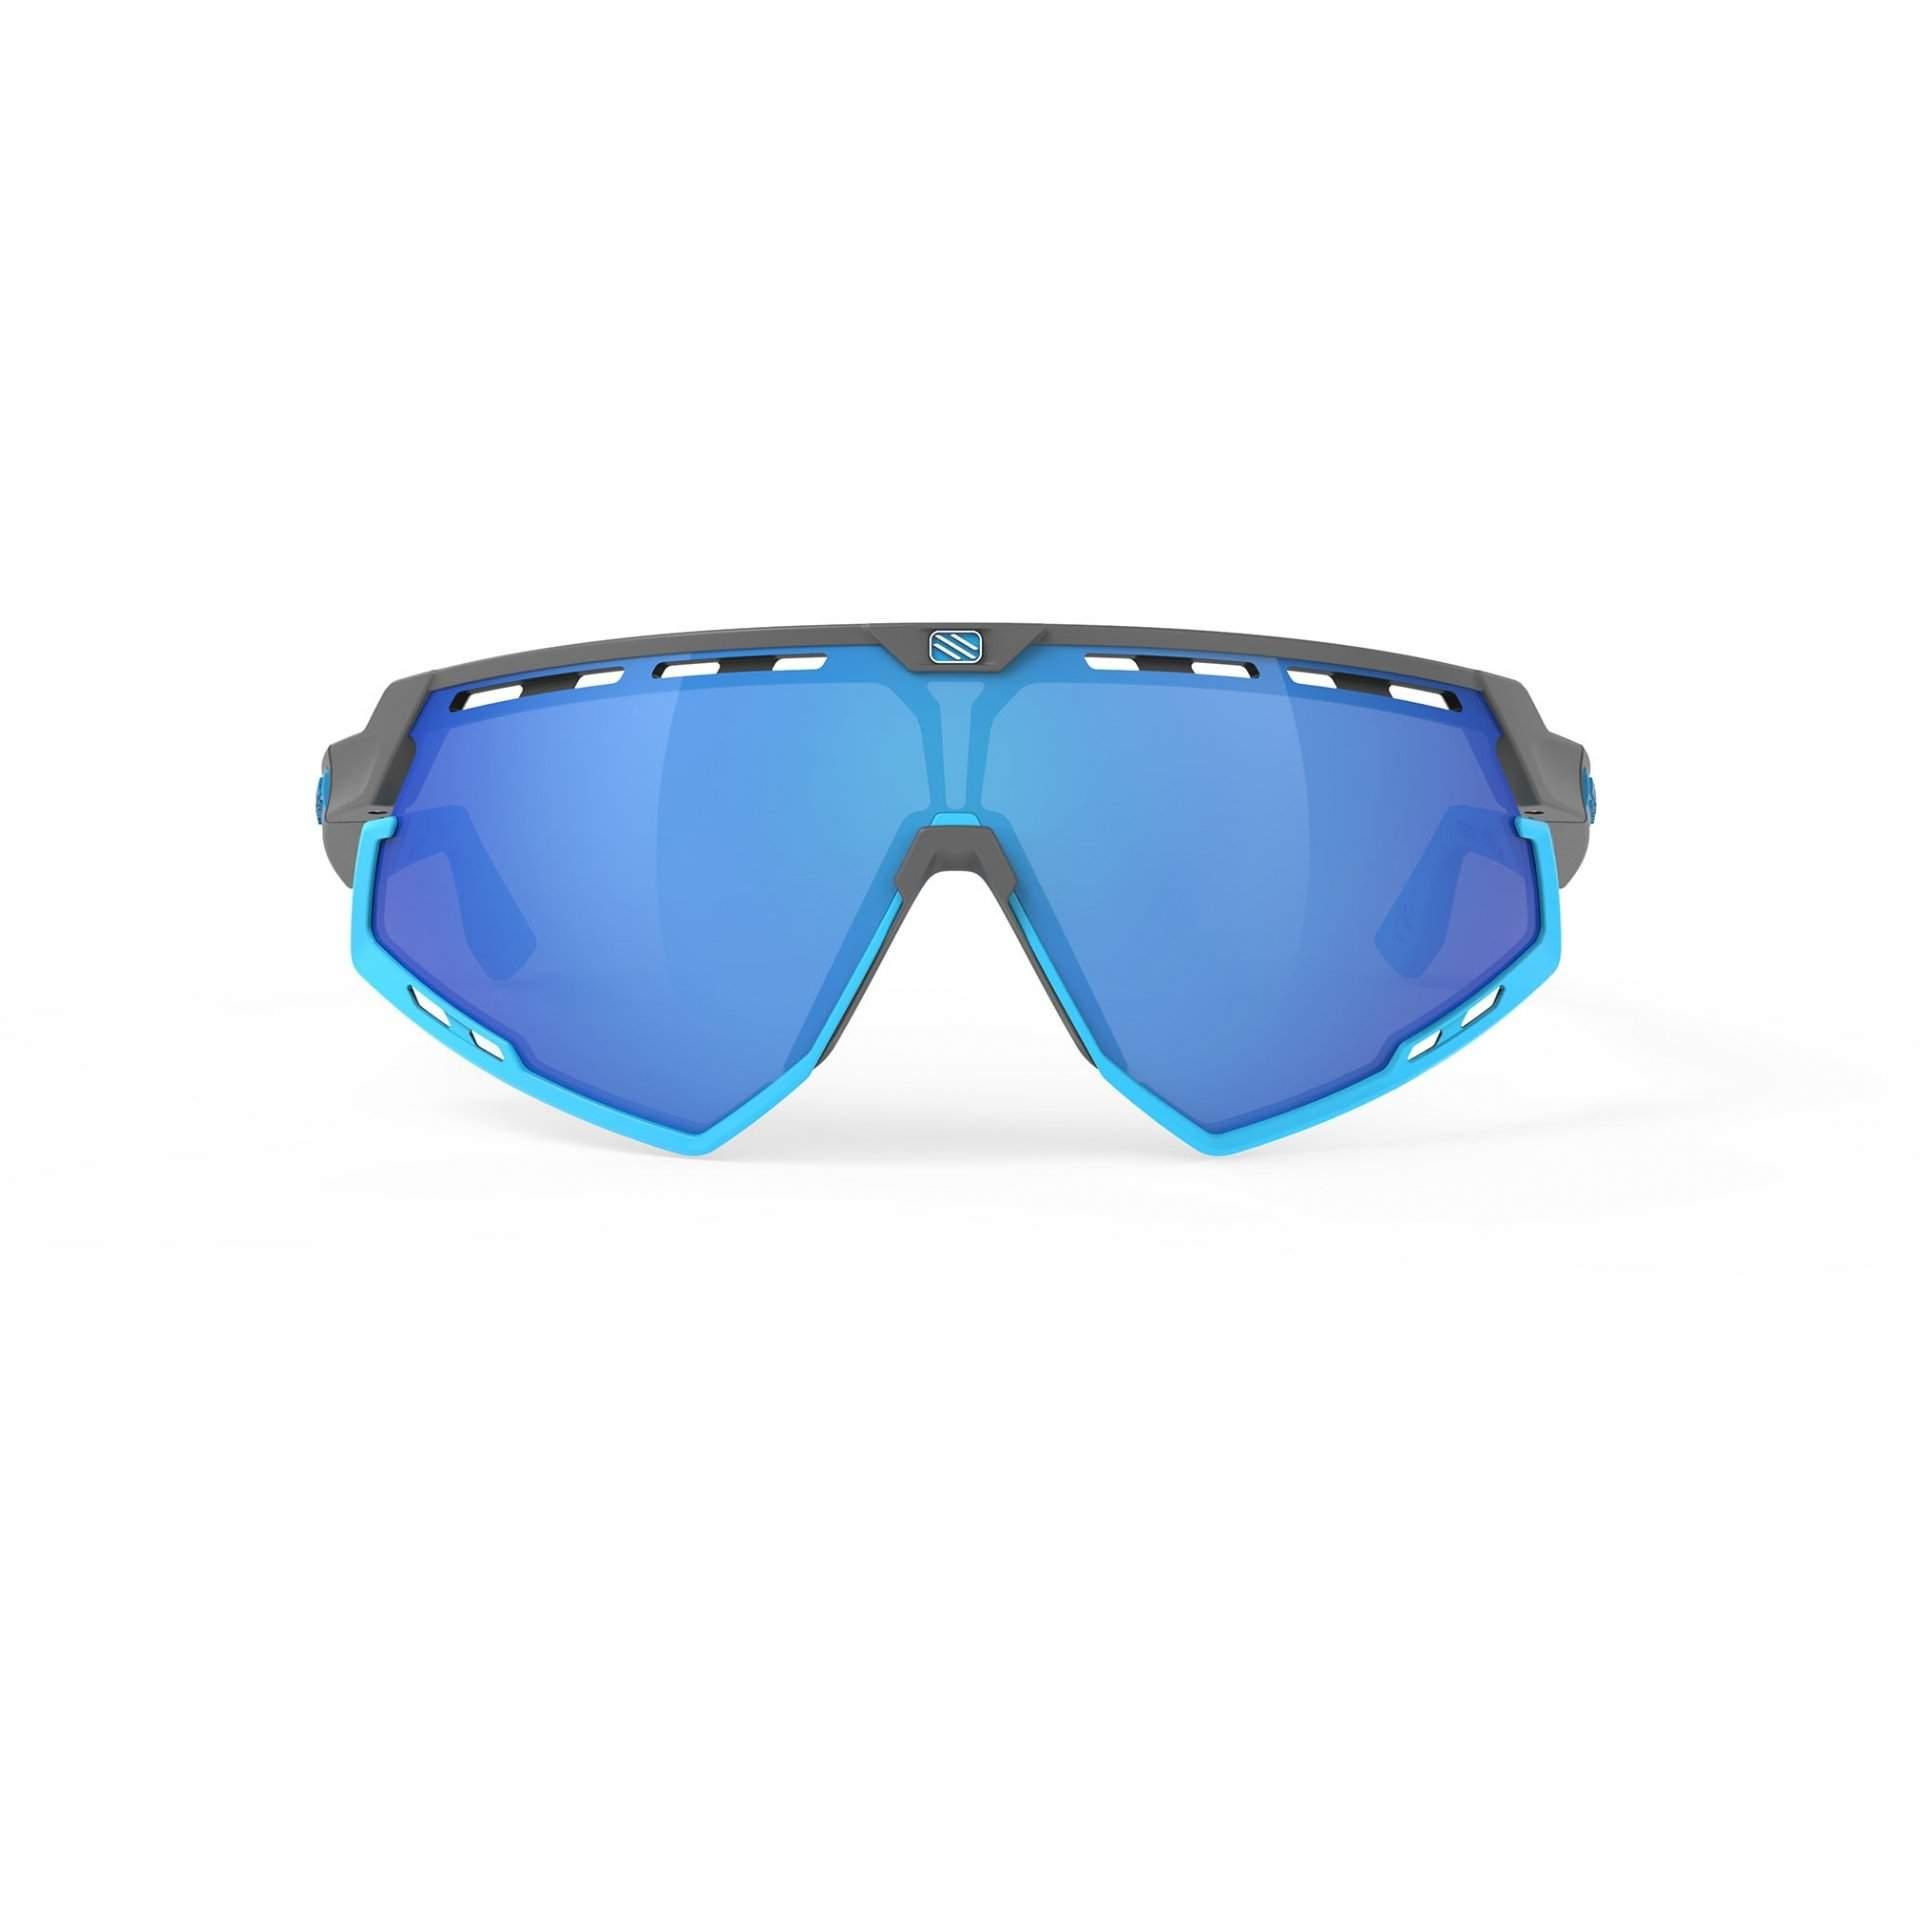 OKULARY RUDY PROJECT DEFENDER MULTILASER BLUE + GGREY BUMPERS AZUR SP5239750002 Z PRZODU